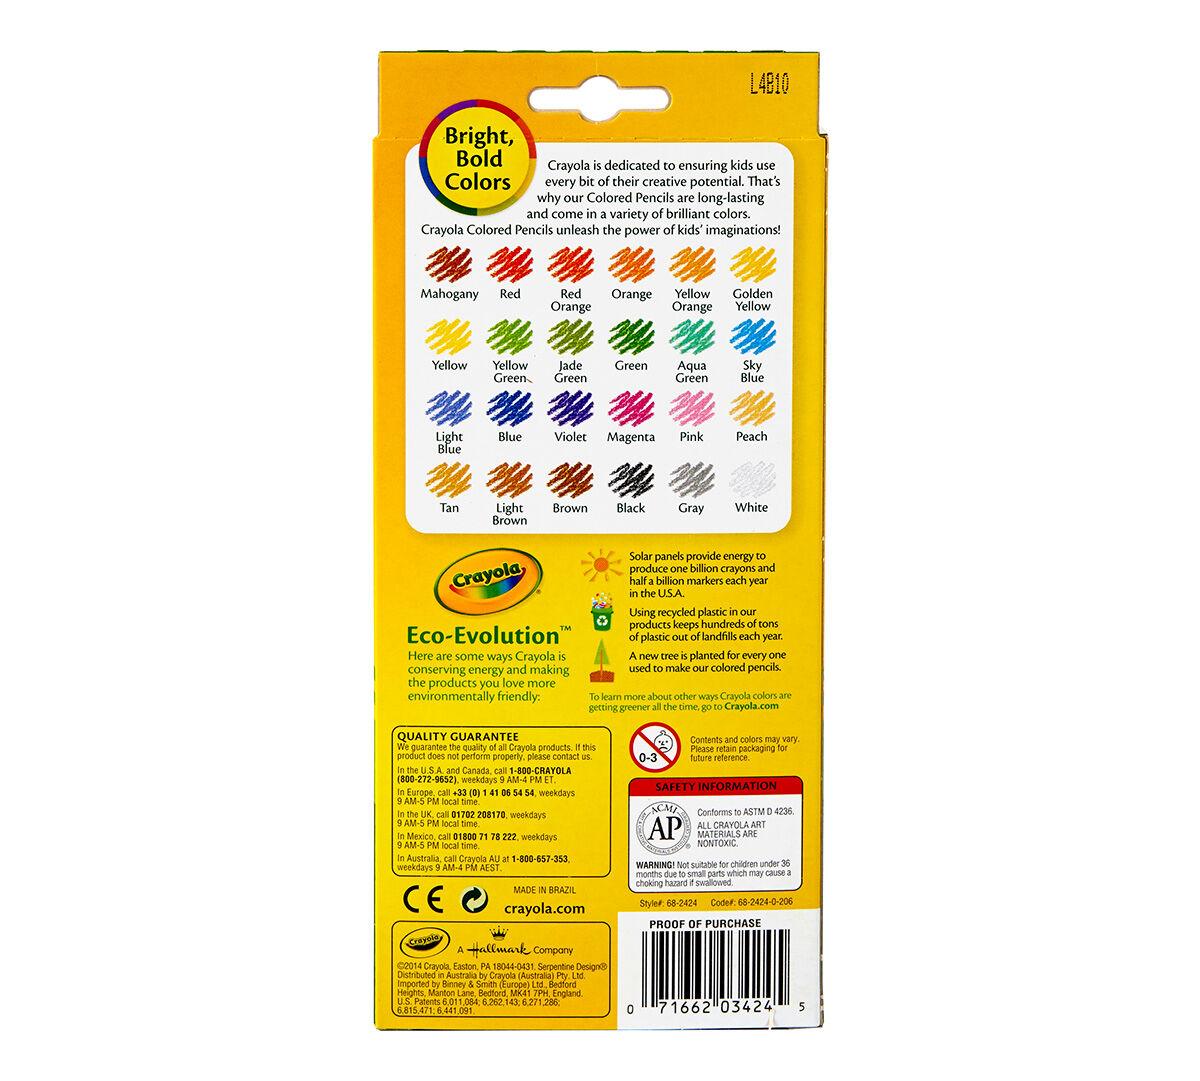 Crayola Erasable Colored Pencils Art Tools Adult Coloring 24 Count